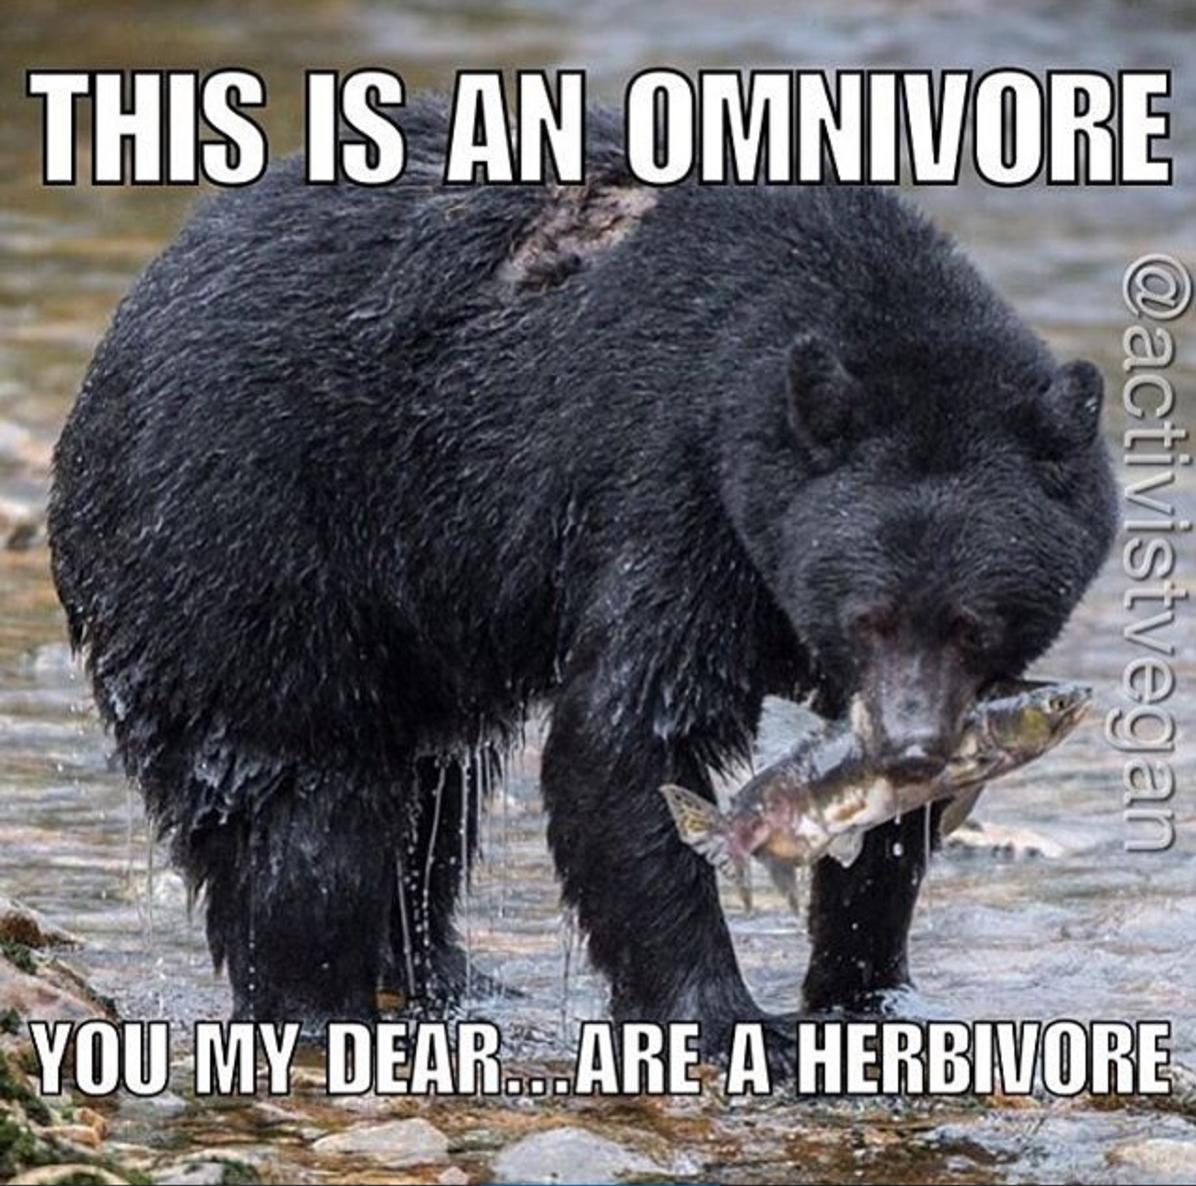 Omnivore Or Herbivore